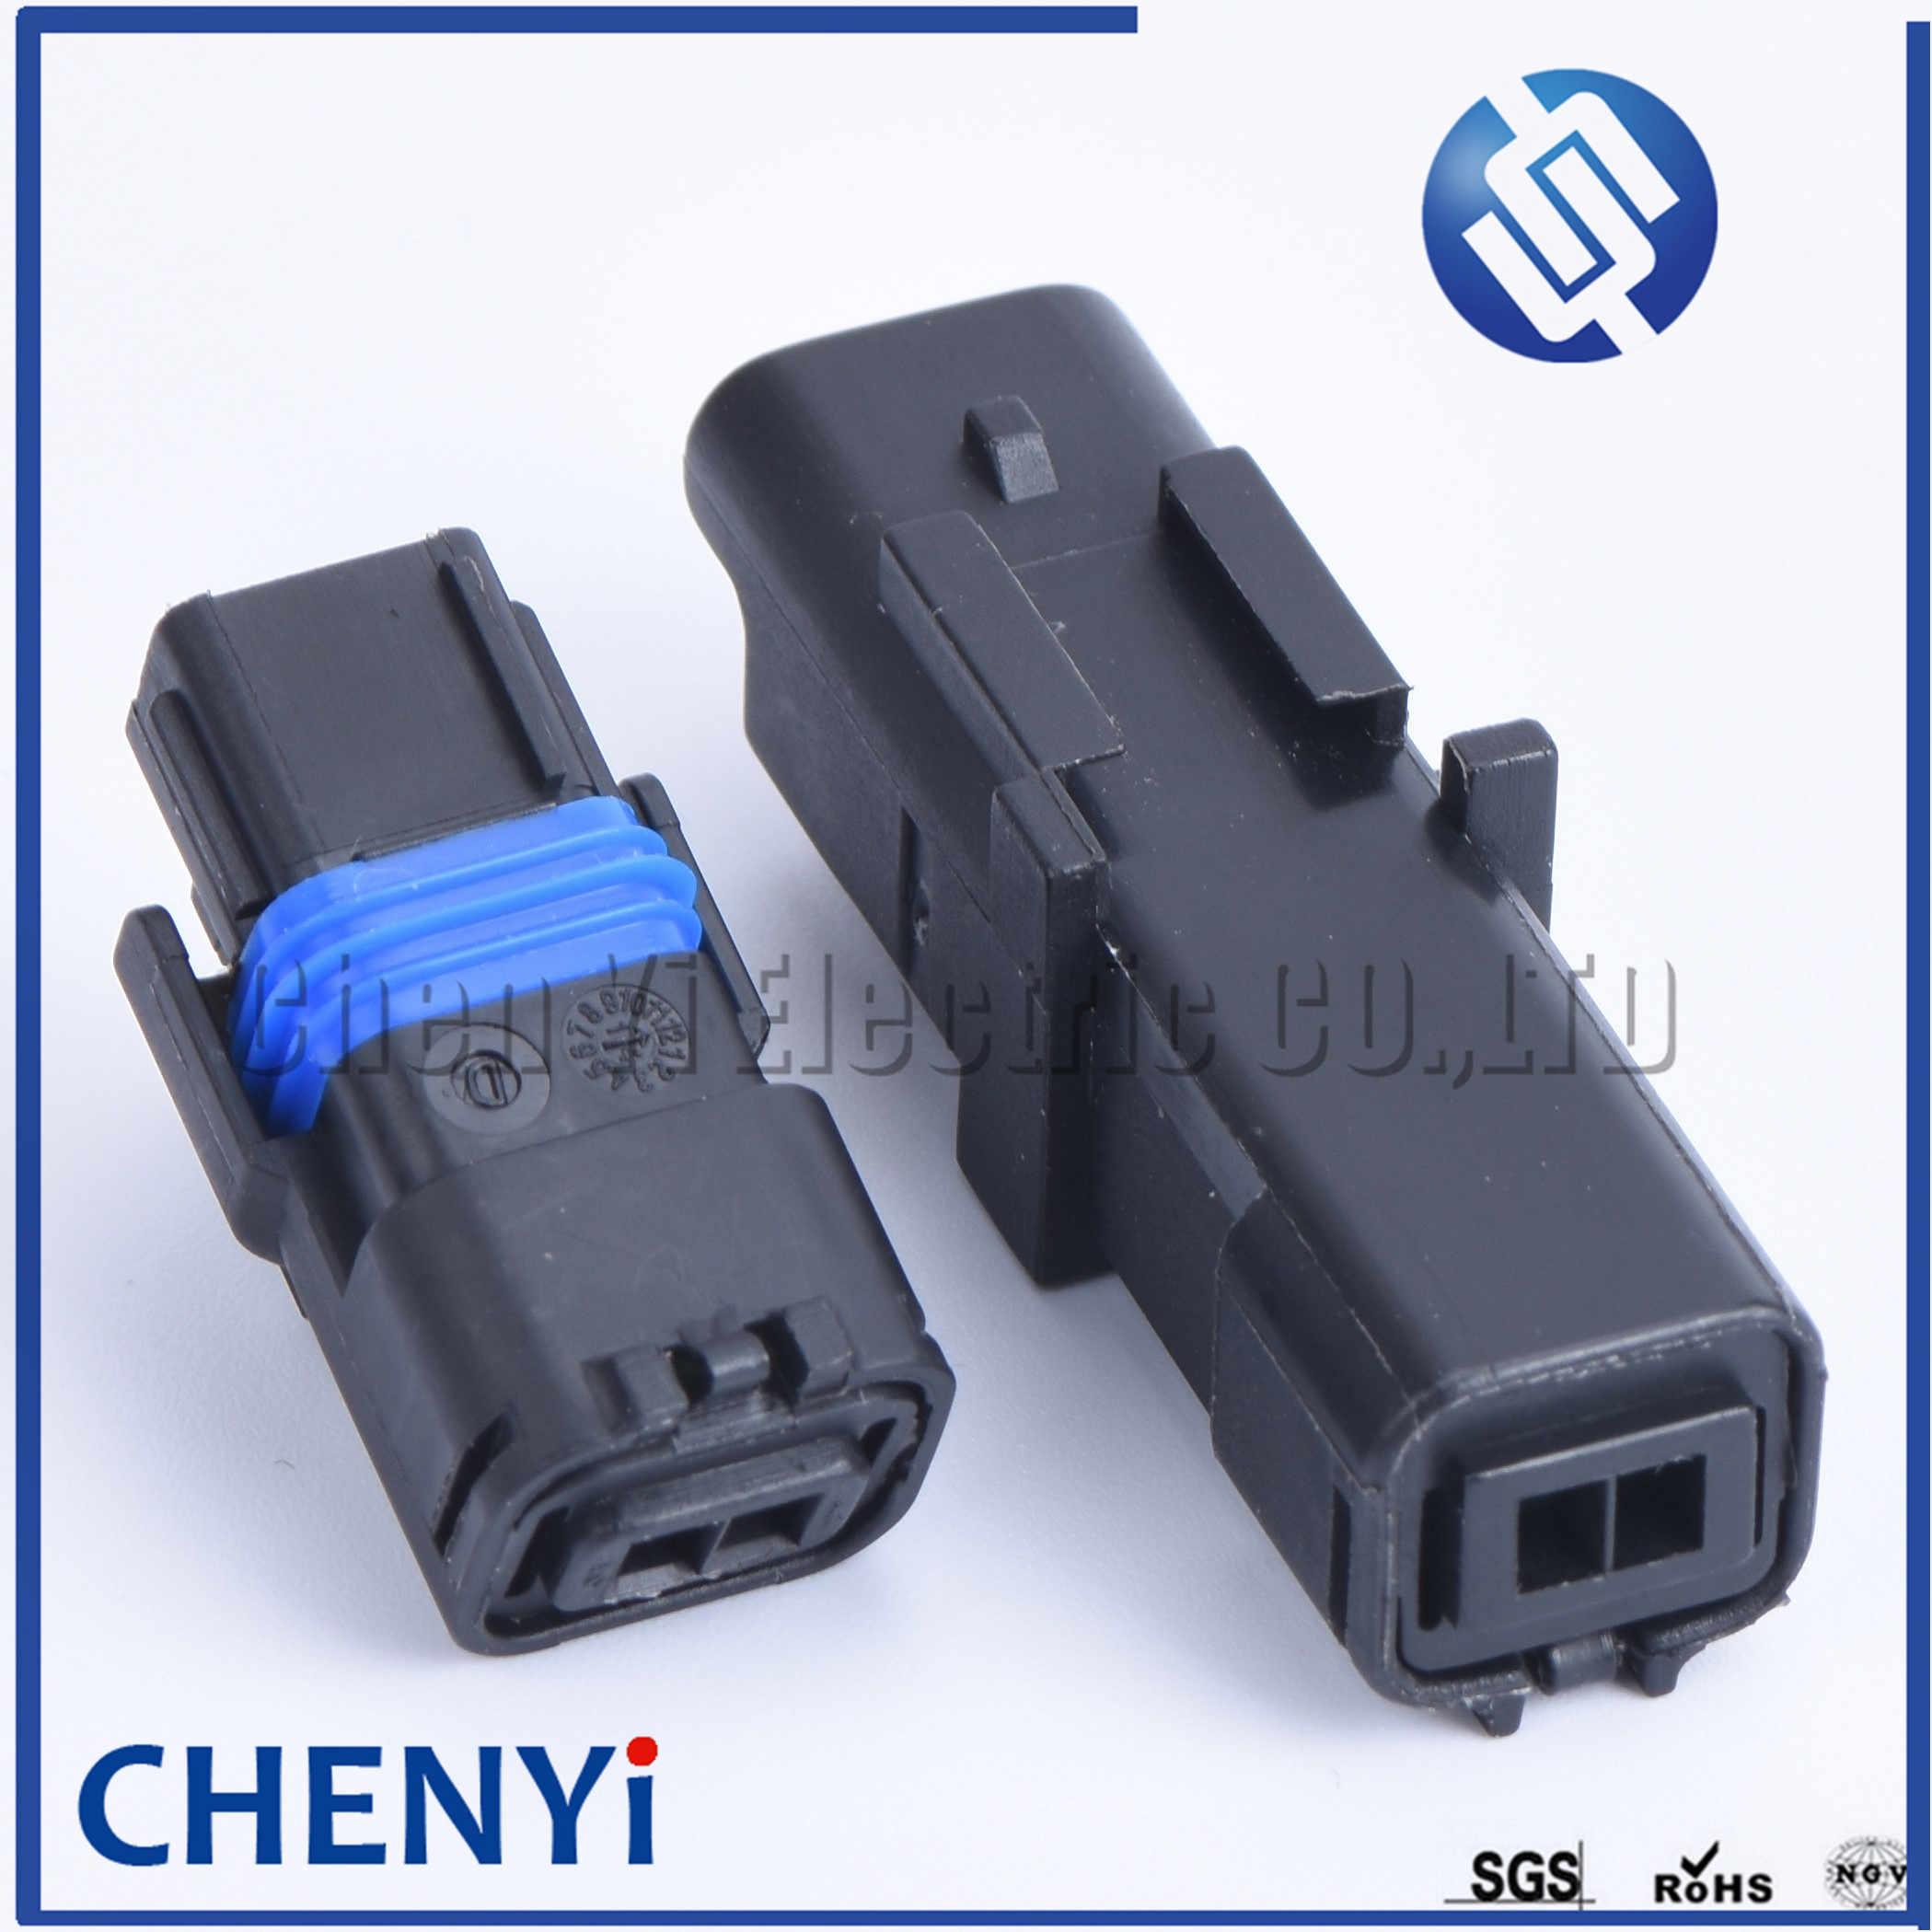 1 Set 2 Pin 211PC022S0049 211PL022S0049 Konektor Otomotif Lamphold Fitting untuk Sicma FCI Con-391 Sein plug